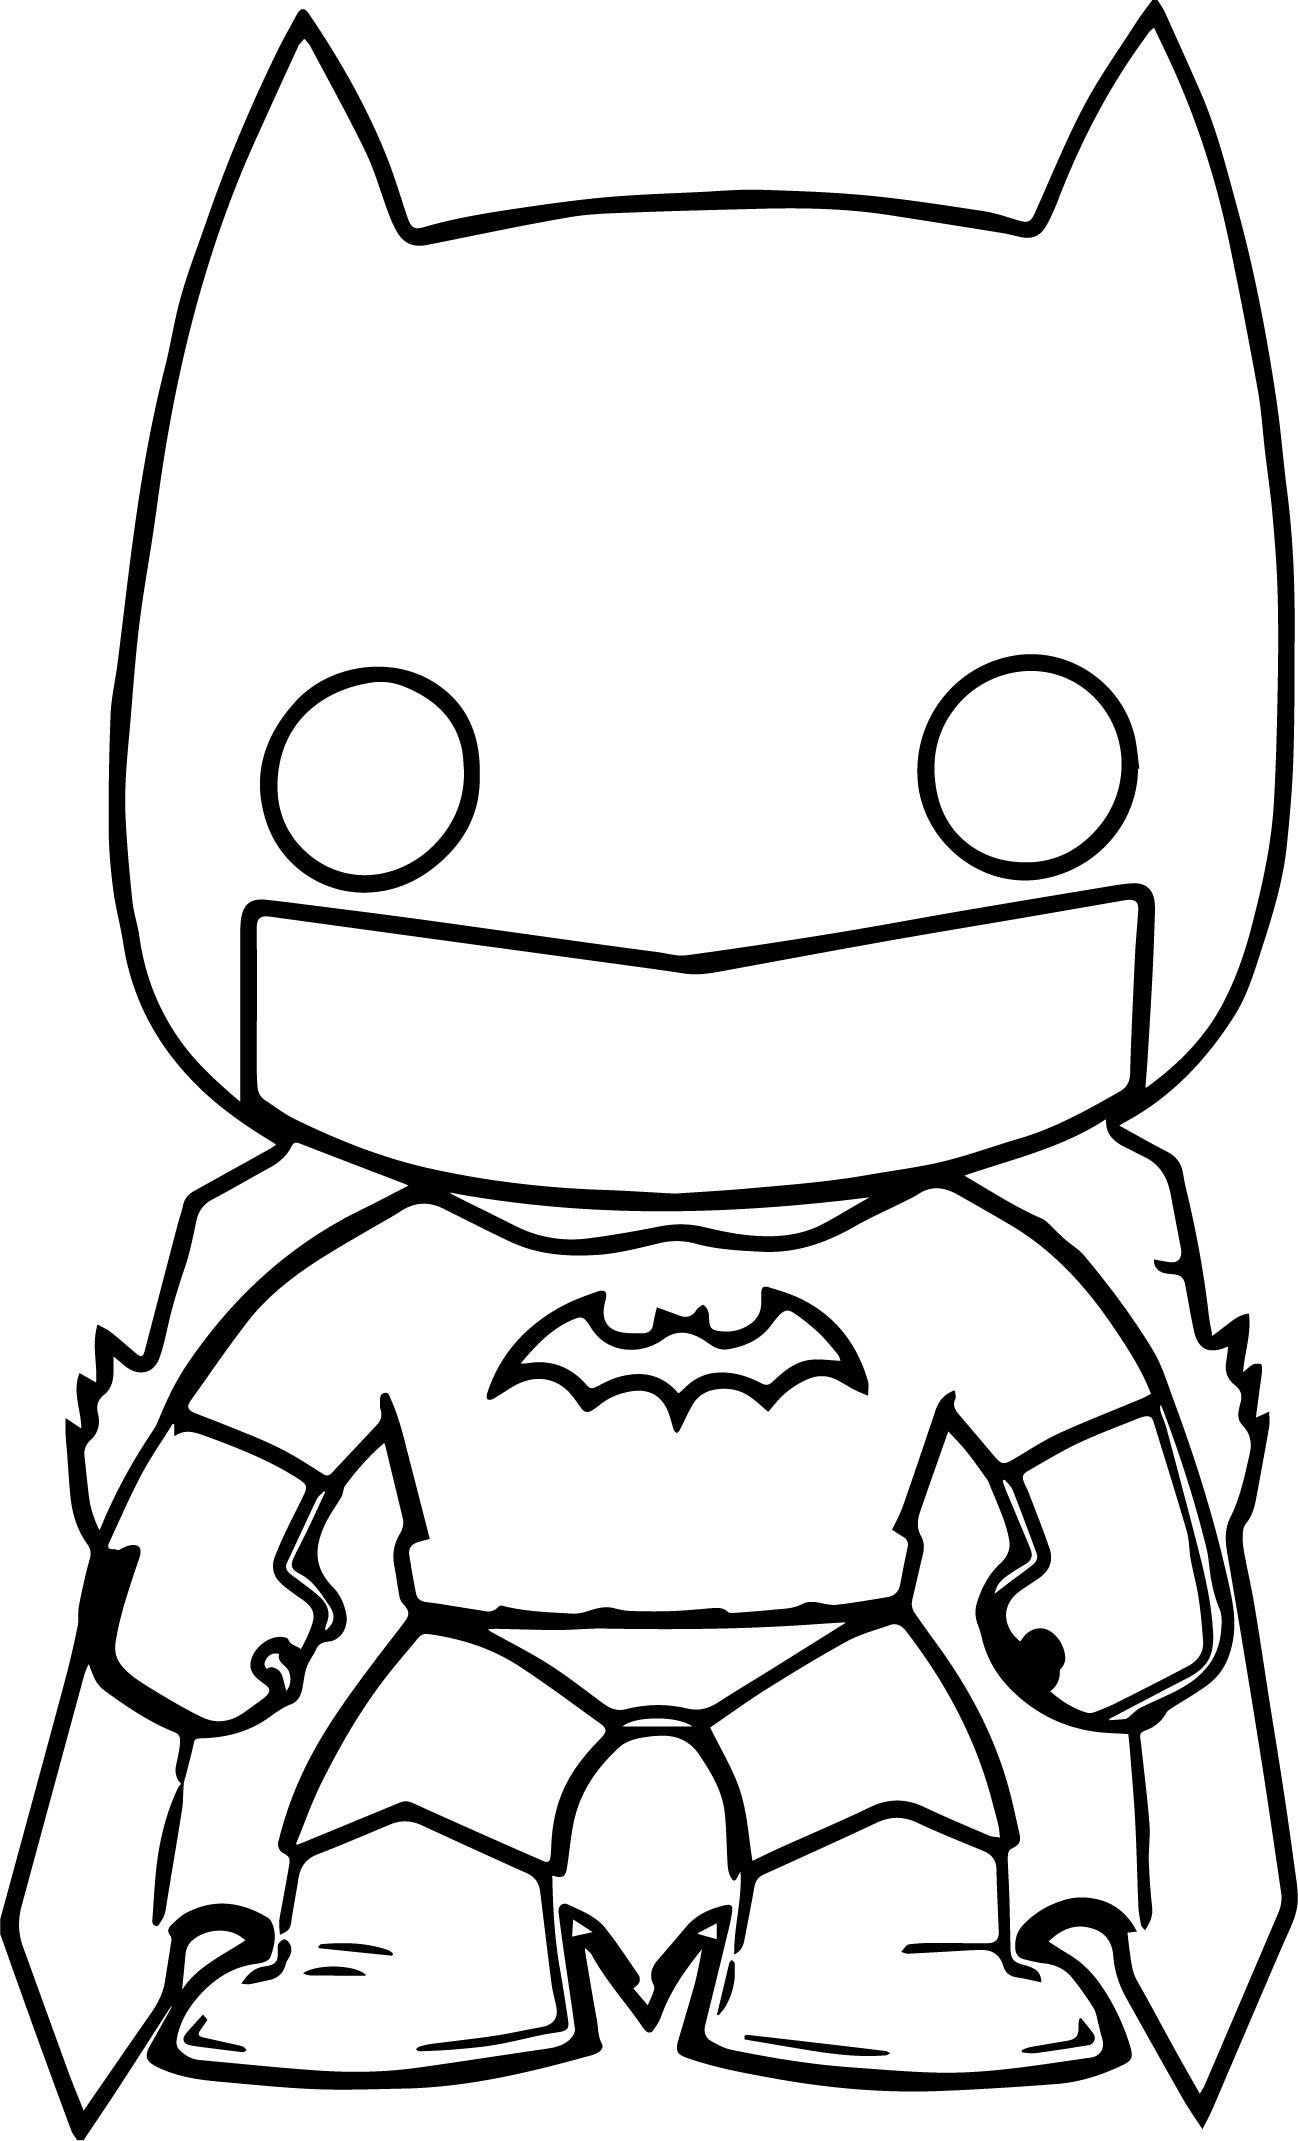 batman printing pages batman coloring pages printing pages batman